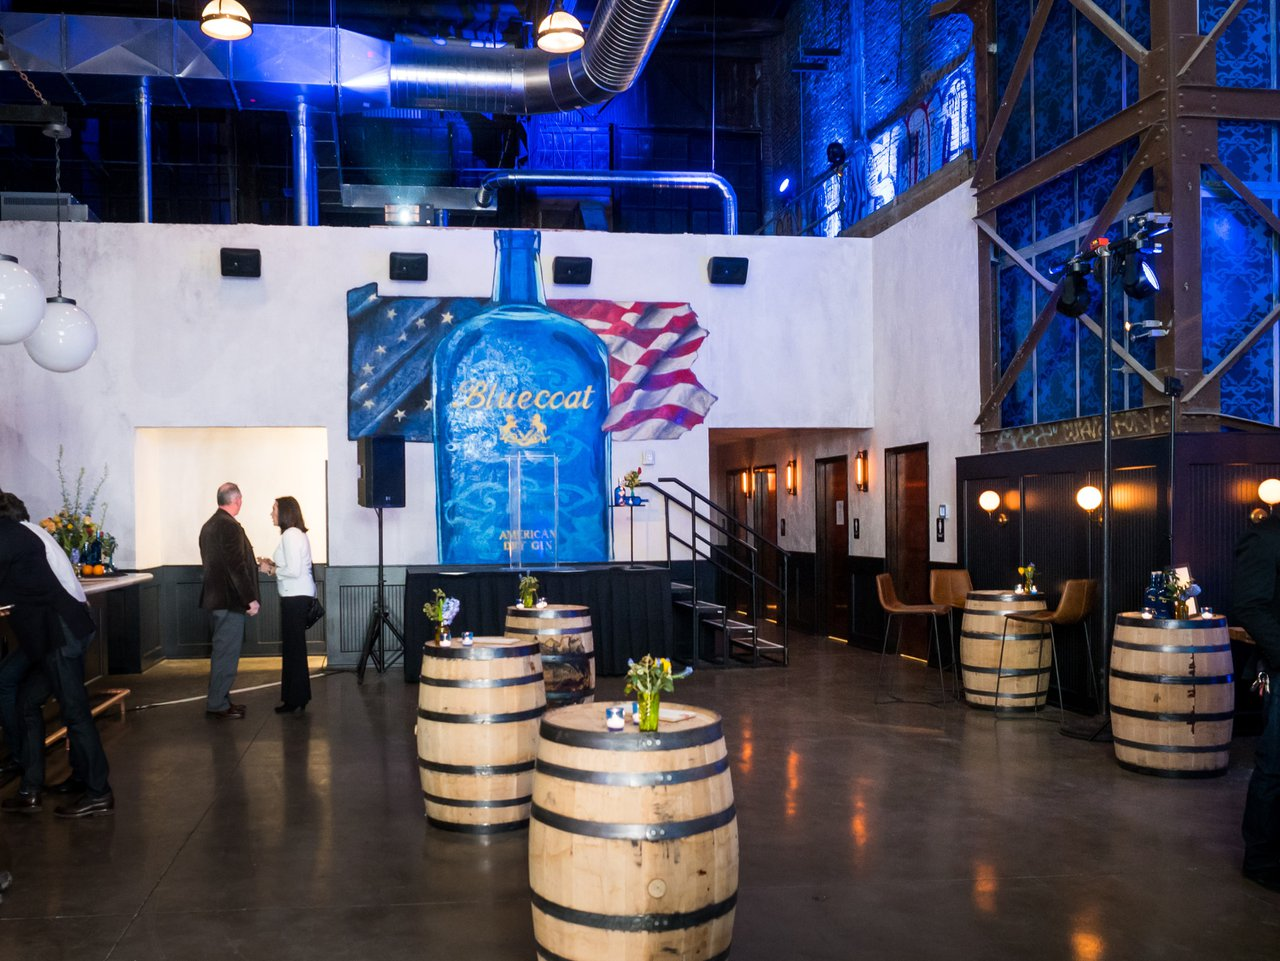 Philadelphia Distilling Grand Opening photo 013_BluecoatGin_Opening.jpg